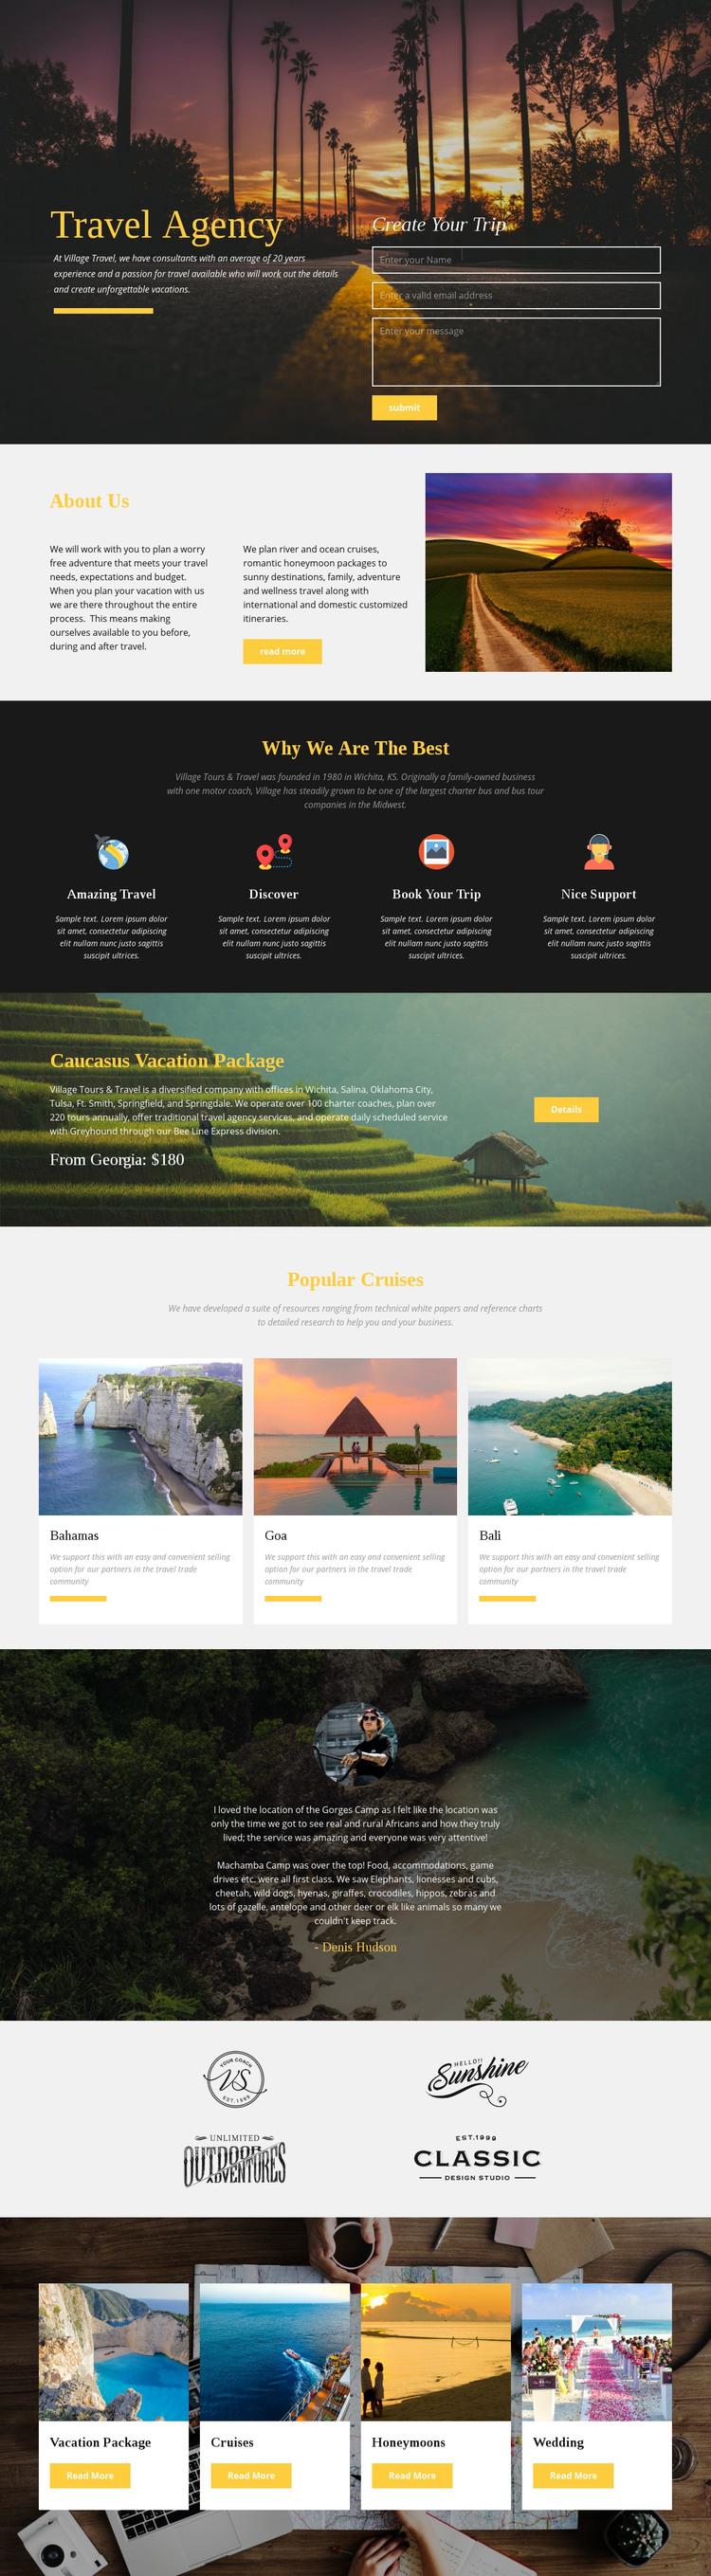 African safari tour company Homepage Design